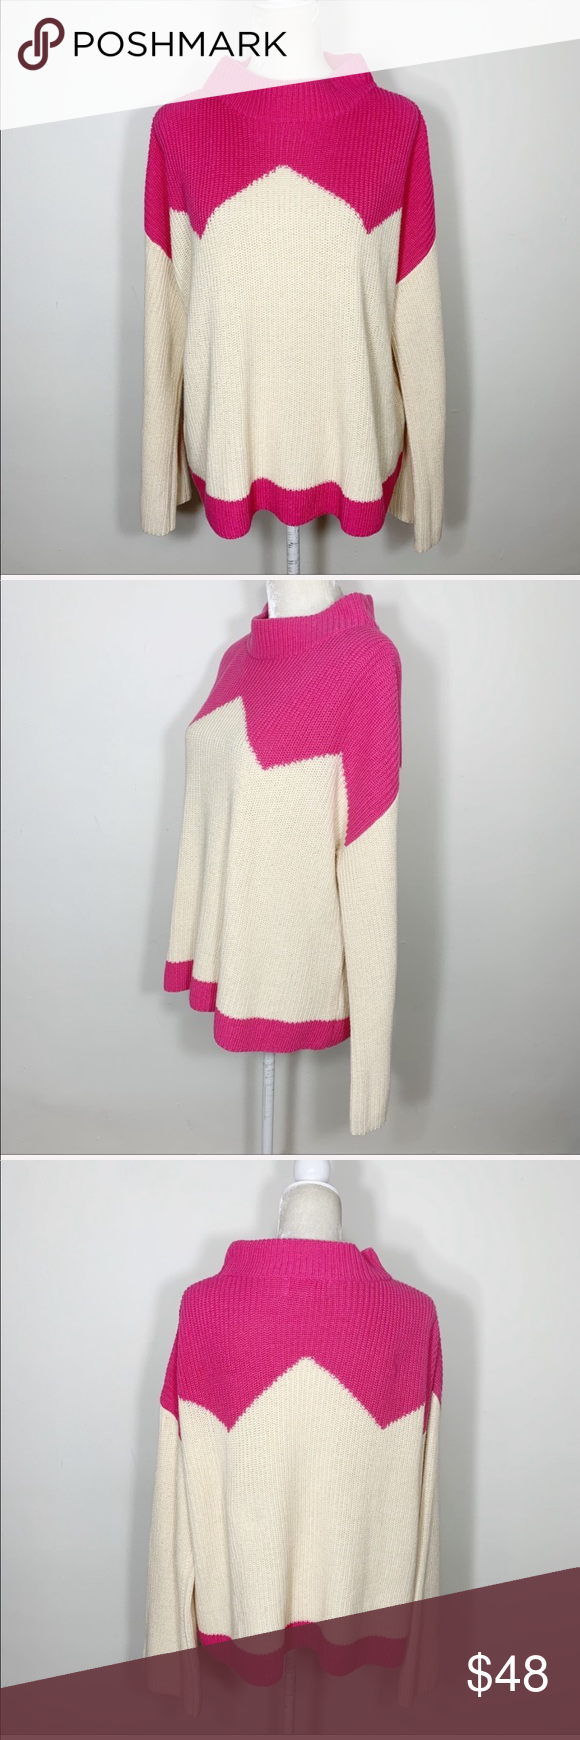 J Crew X The Reeds Pink Zig Zag Knit Sweater Knitted Sweaters Sweaters For Women Sweaters